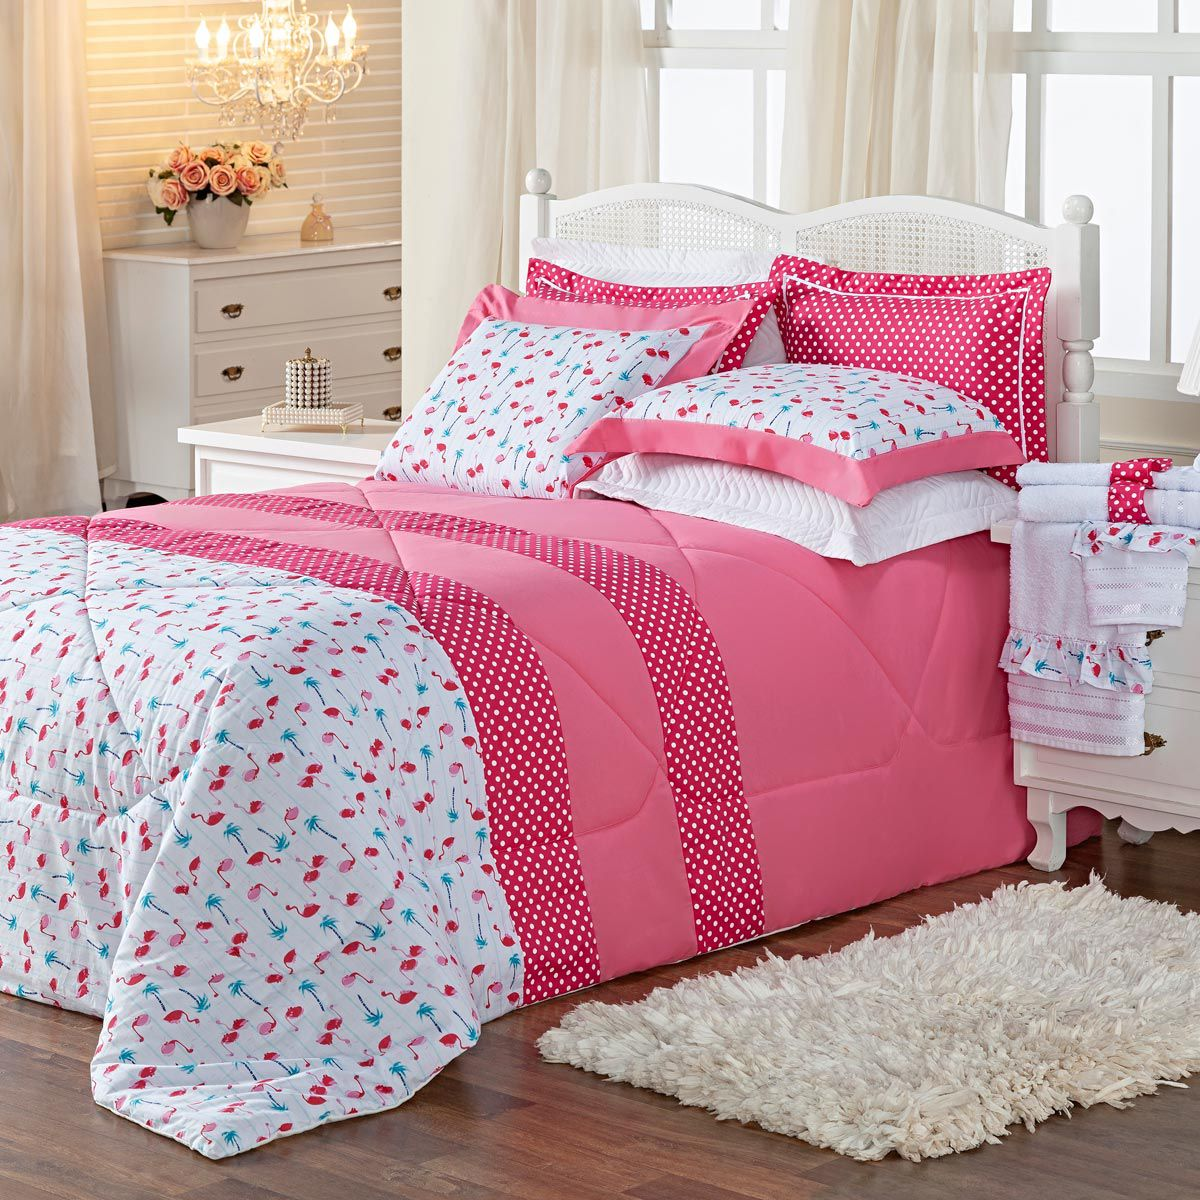 f2fff82cf5 Kit Combo Edredom + Jogo de Banho Flamingo Pink Queen 10 Peças ...